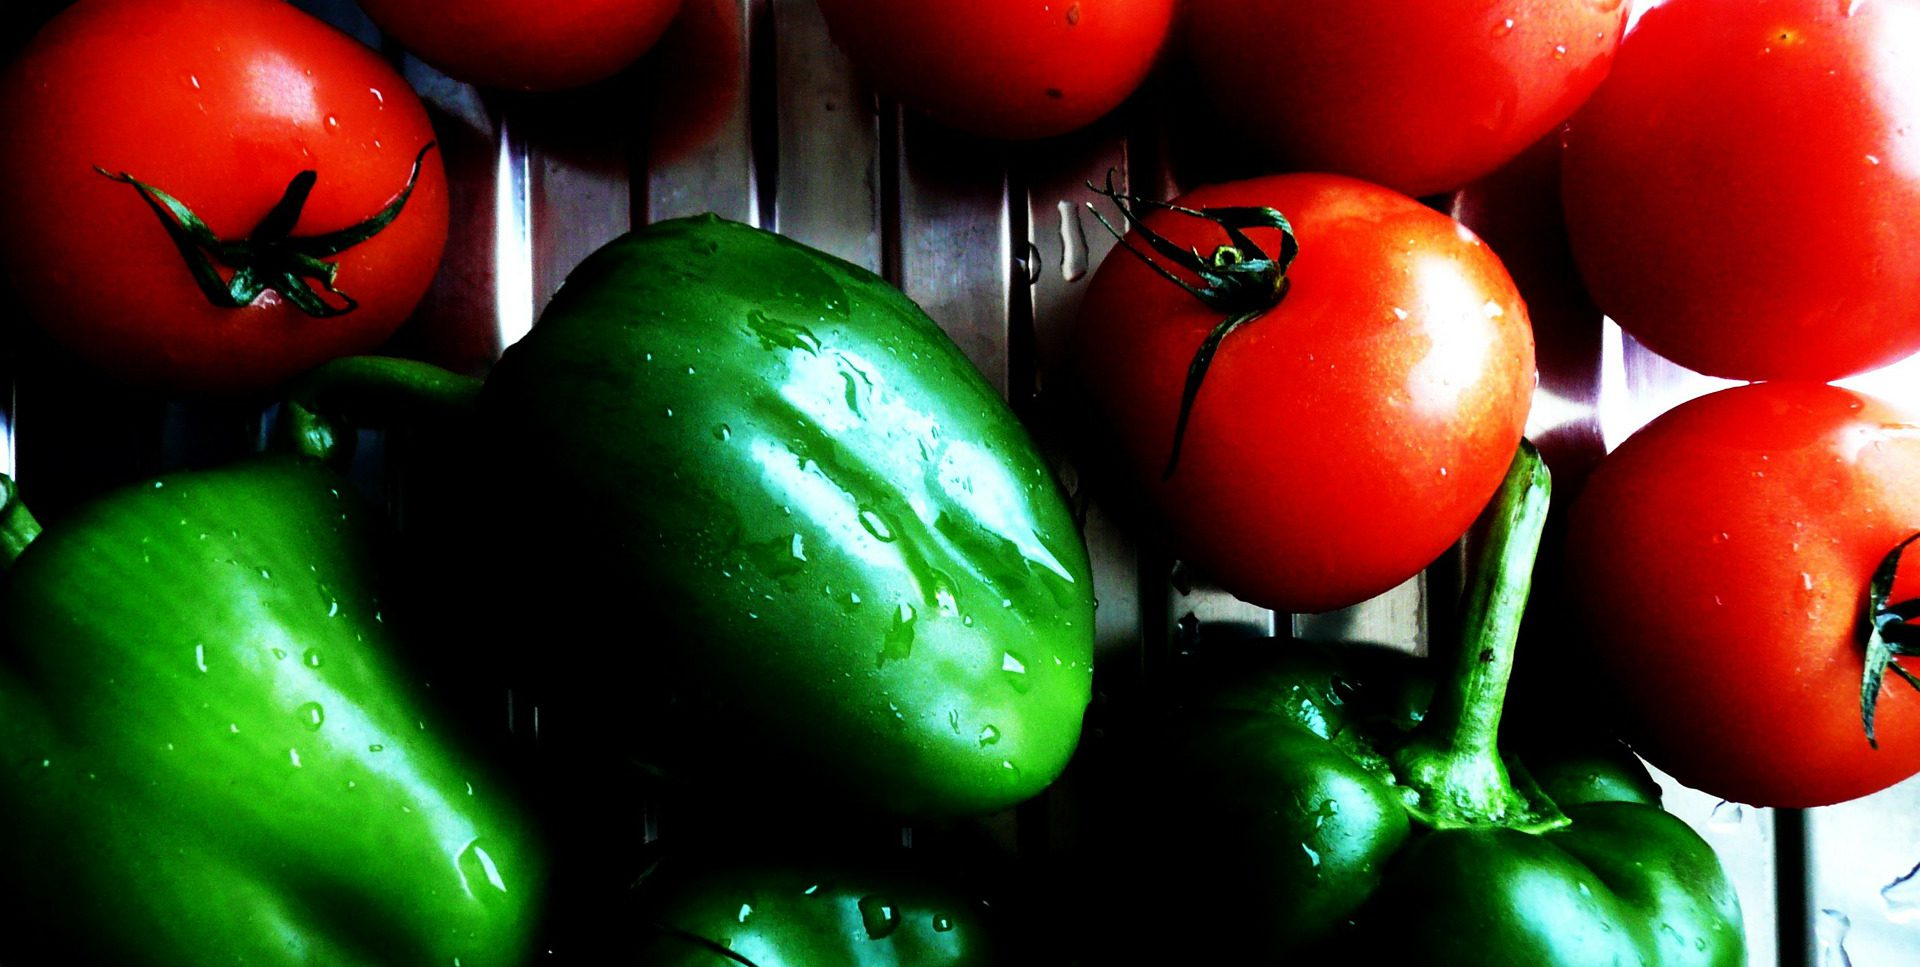 tomatoes-19577_1920